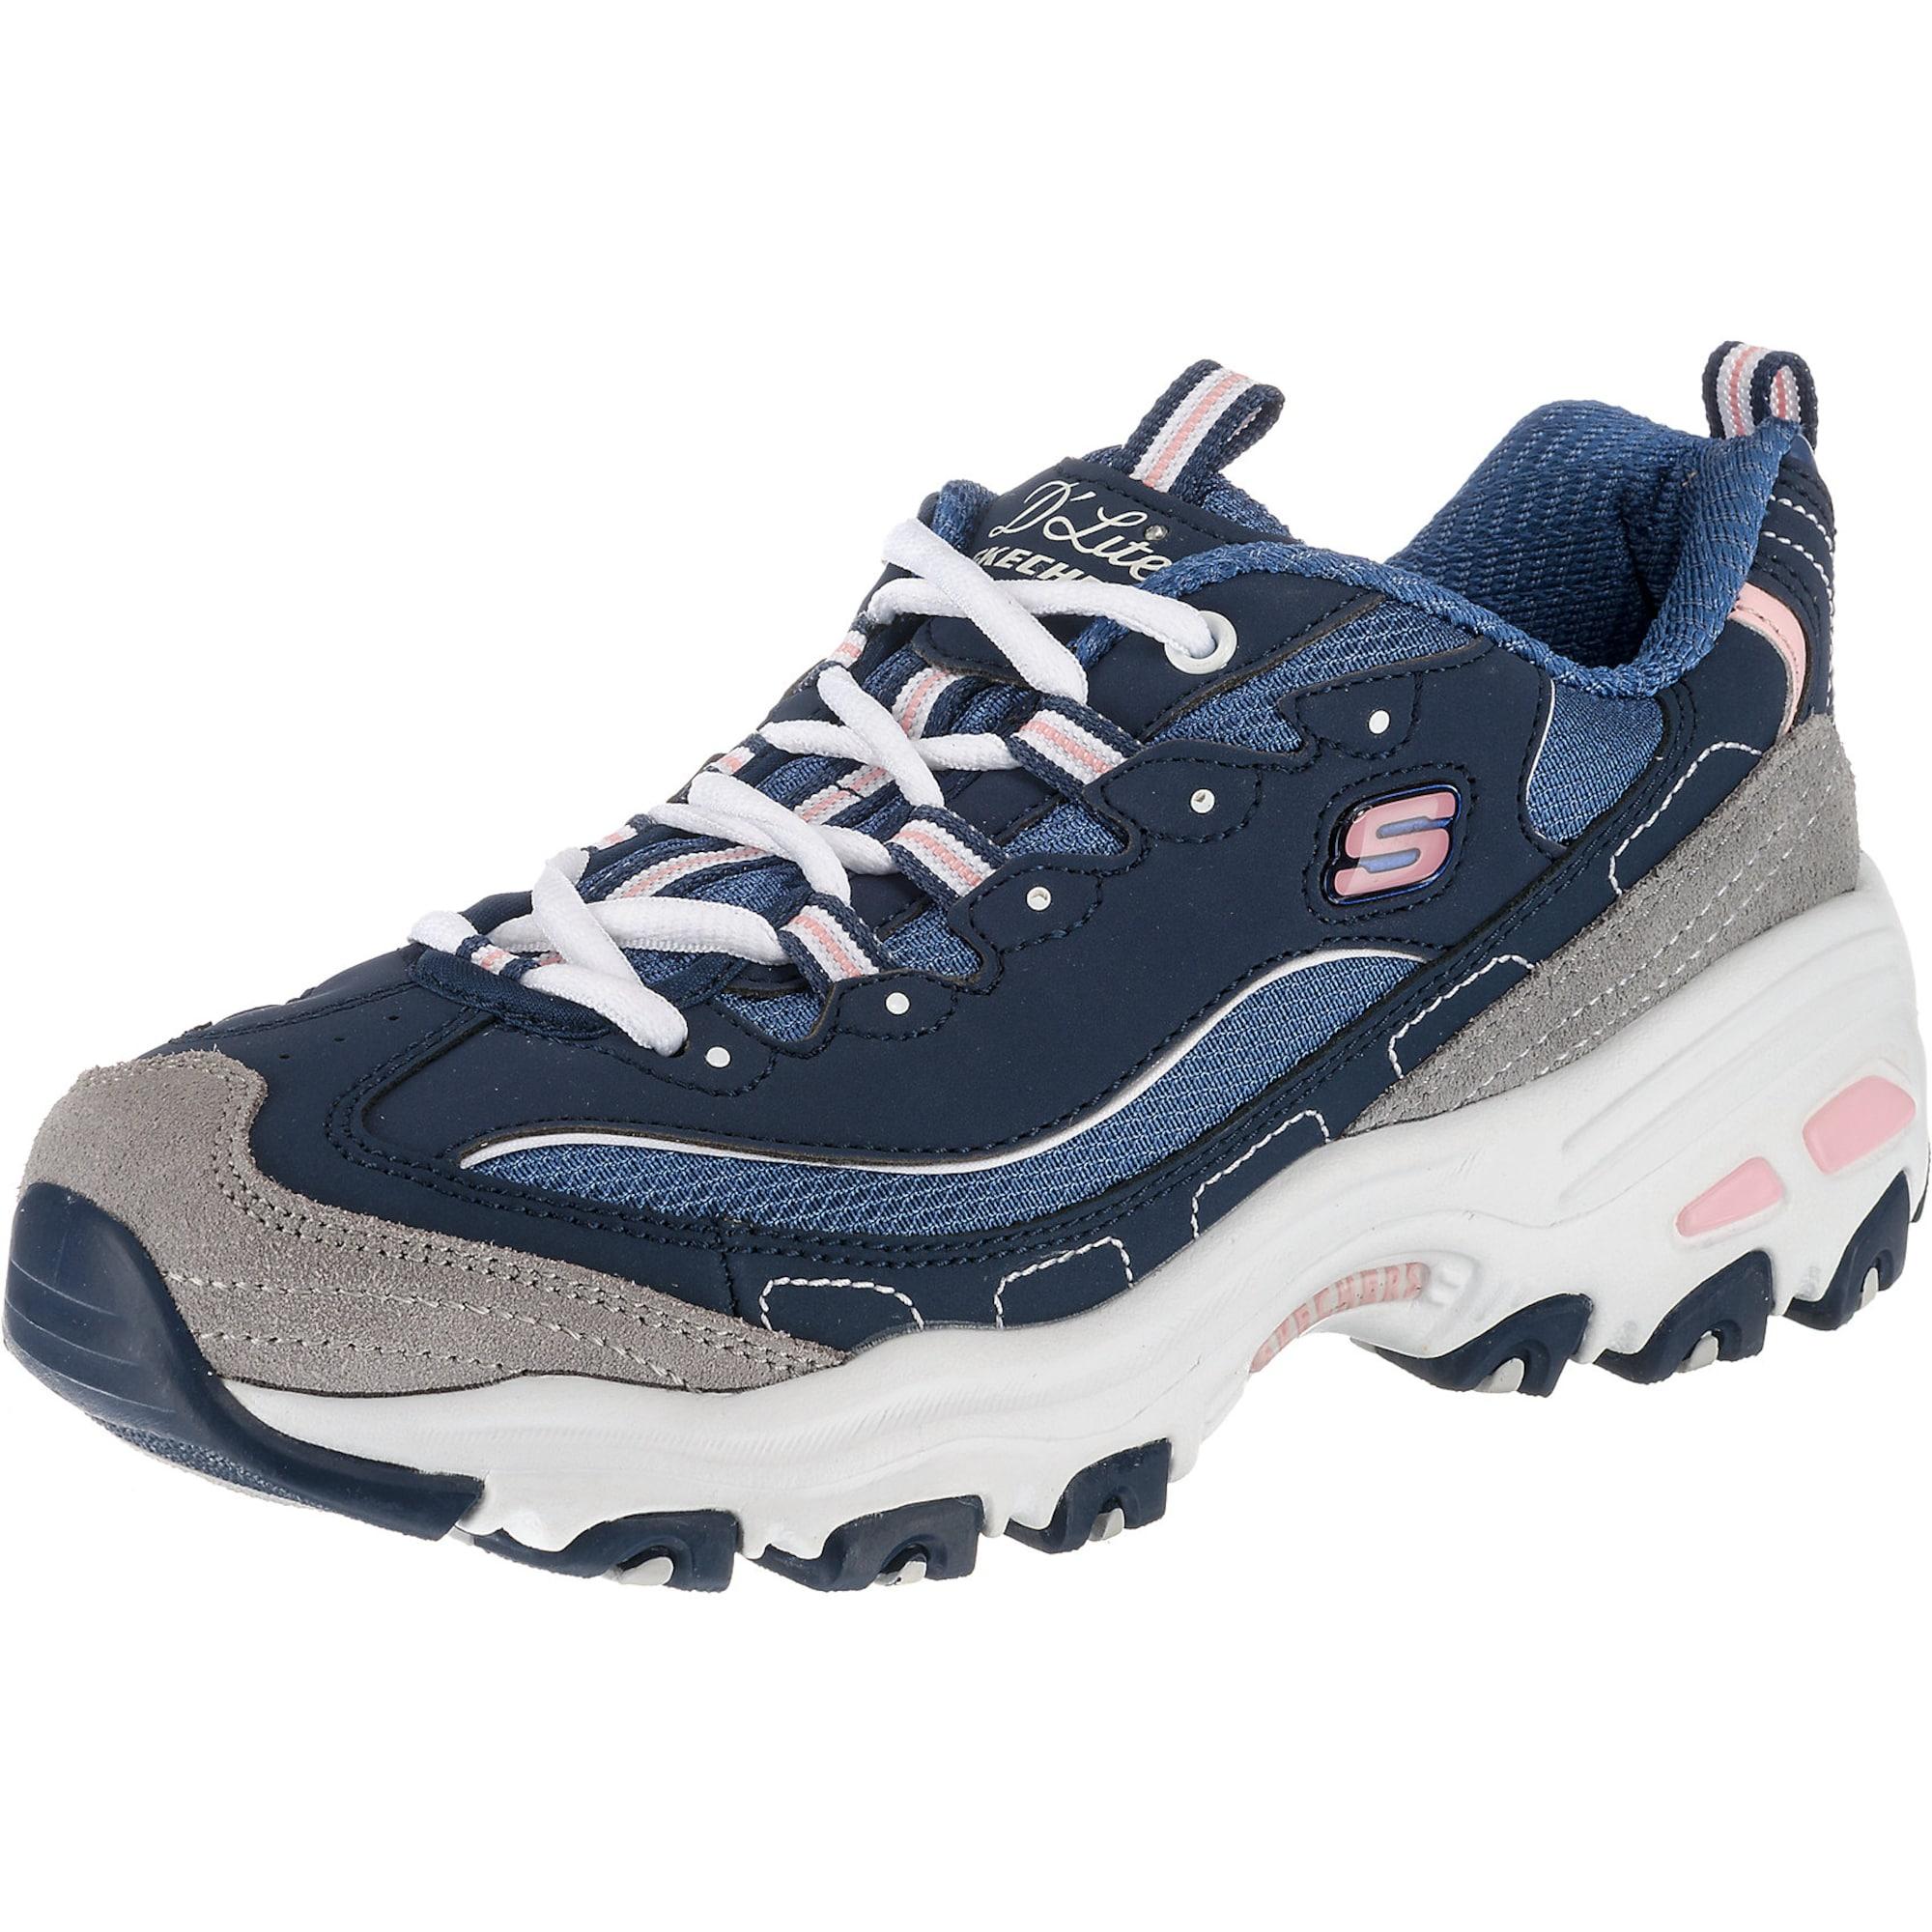 skechers - Sneaker ´D´LITES NEW JOURNEY´